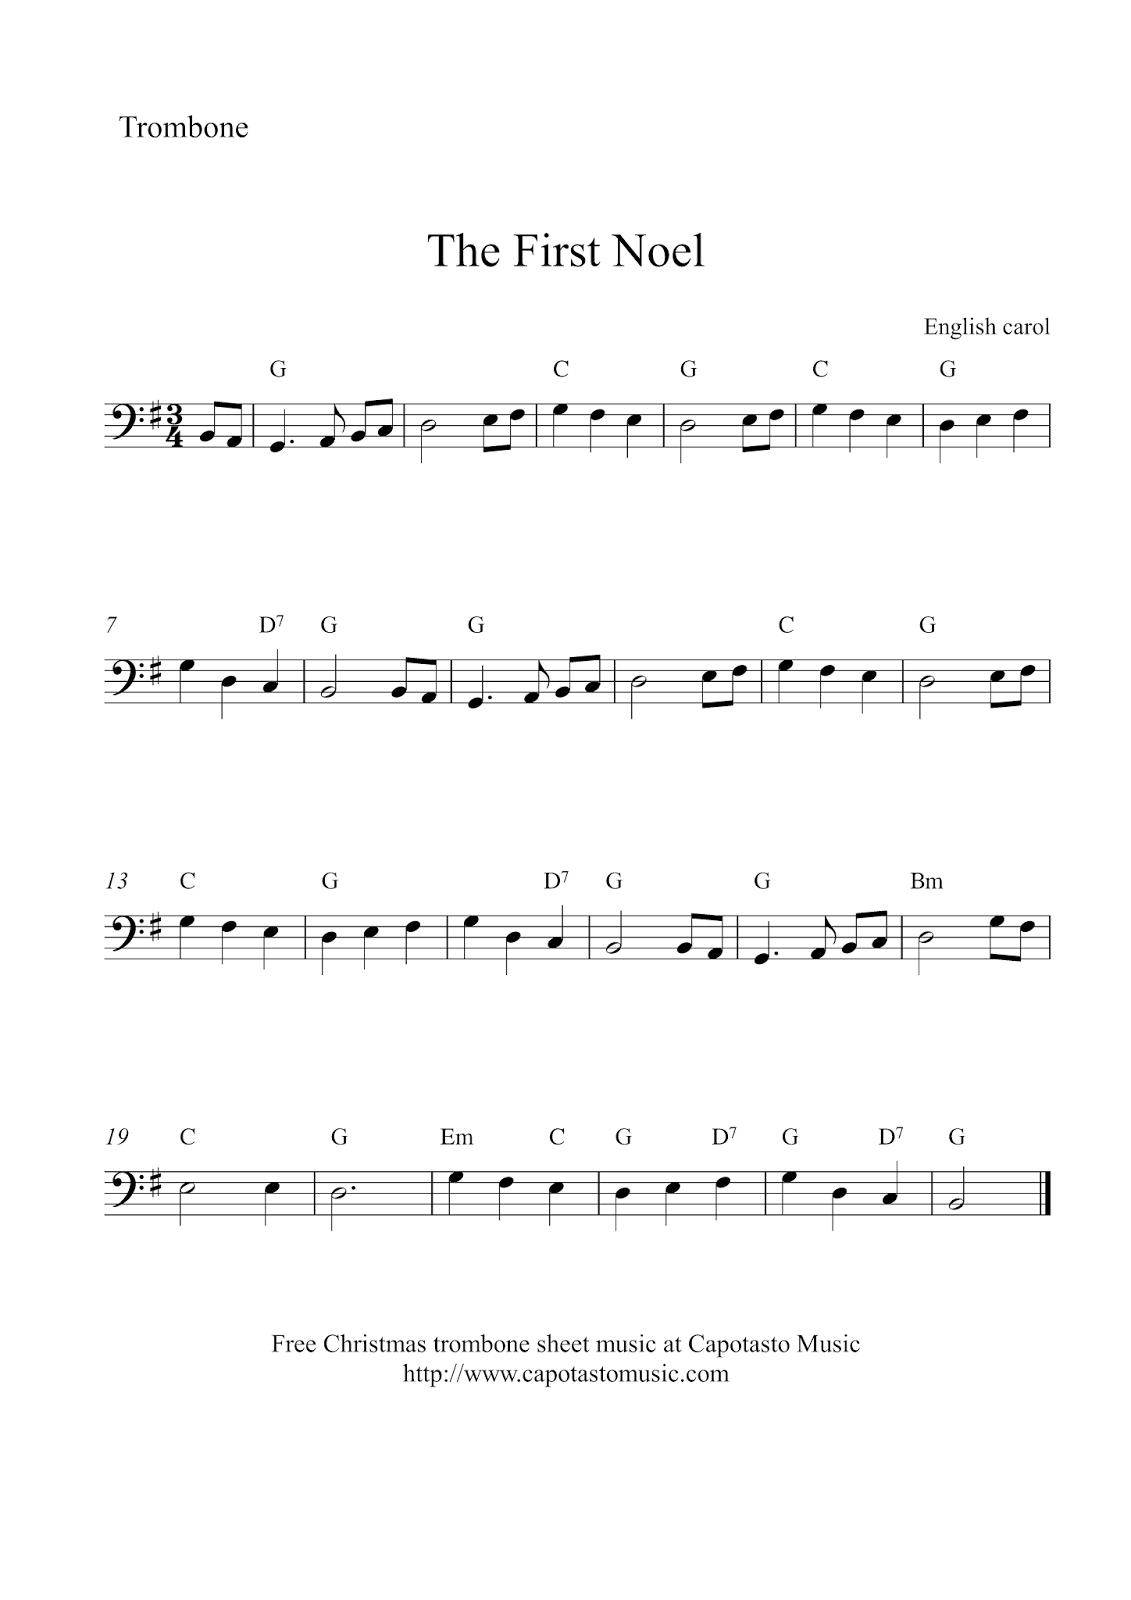 Free Christmas Trombone Sheet Music - The First Noel - Trombone Christmas Sheet Music Free Printable